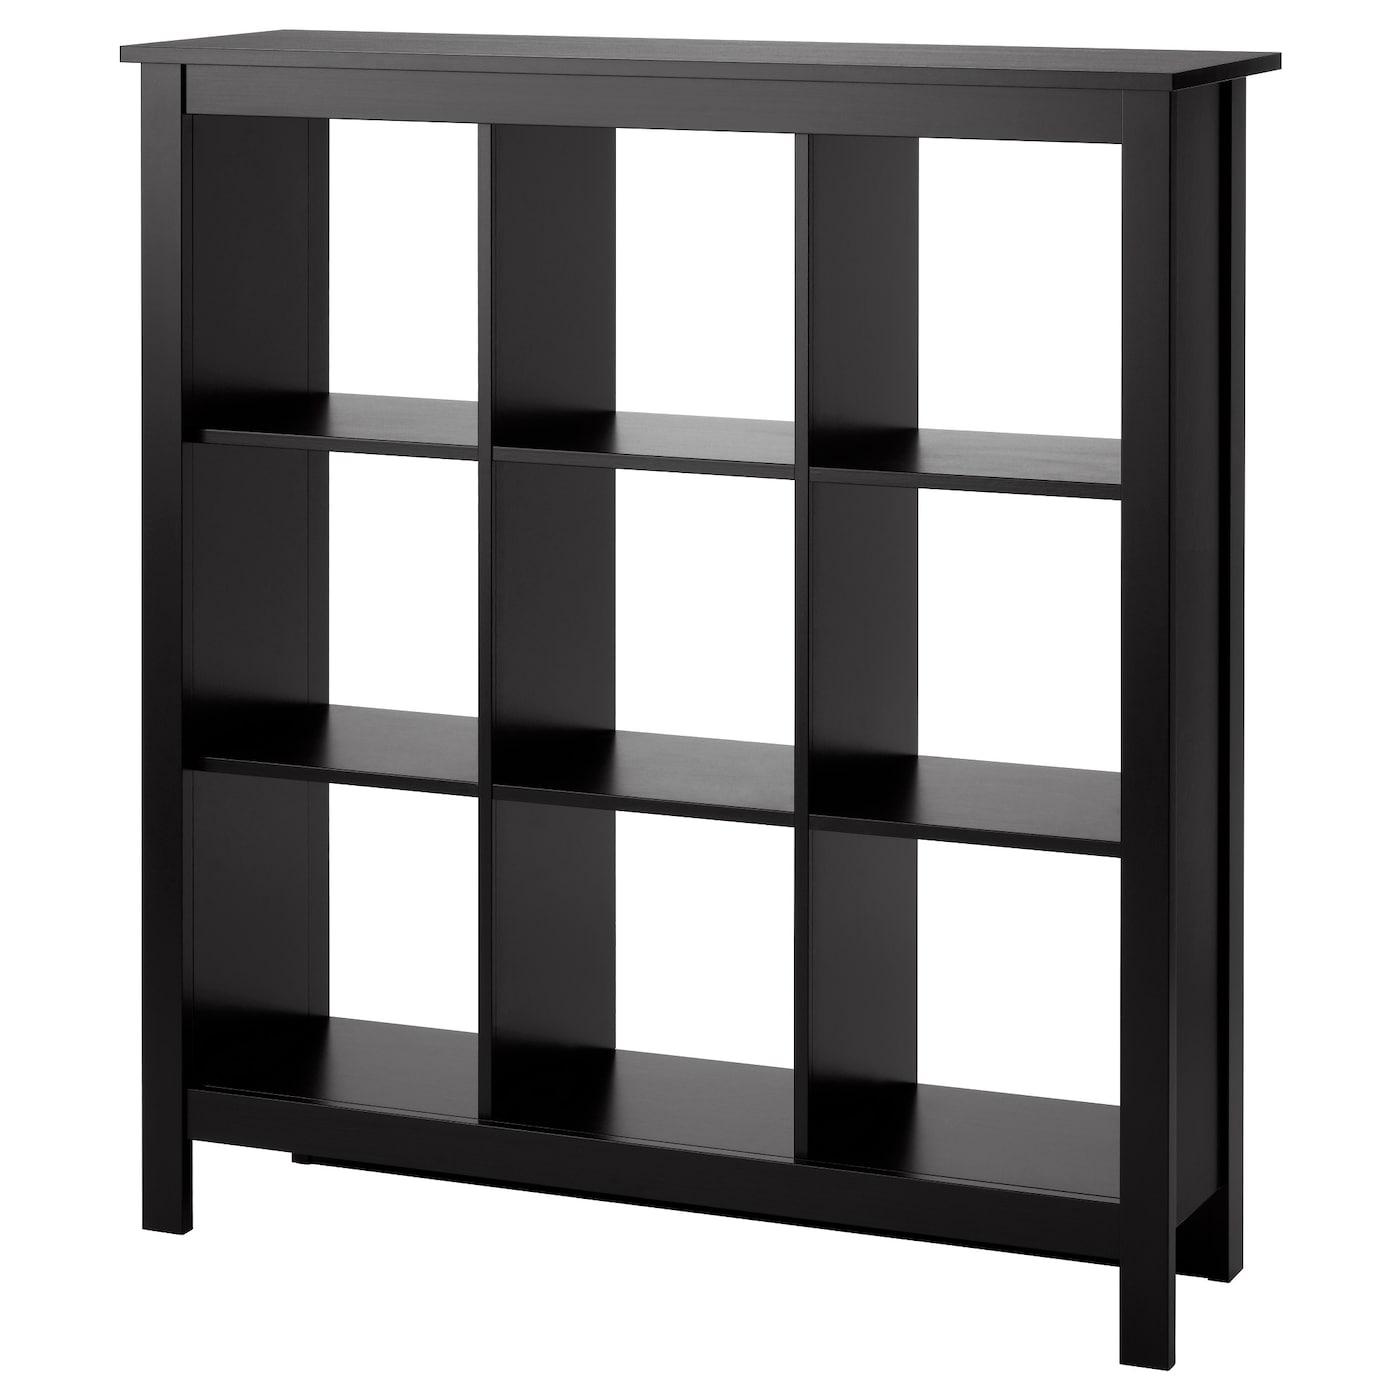 tomn s tag re brun noir 116x127 cm ikea. Black Bedroom Furniture Sets. Home Design Ideas